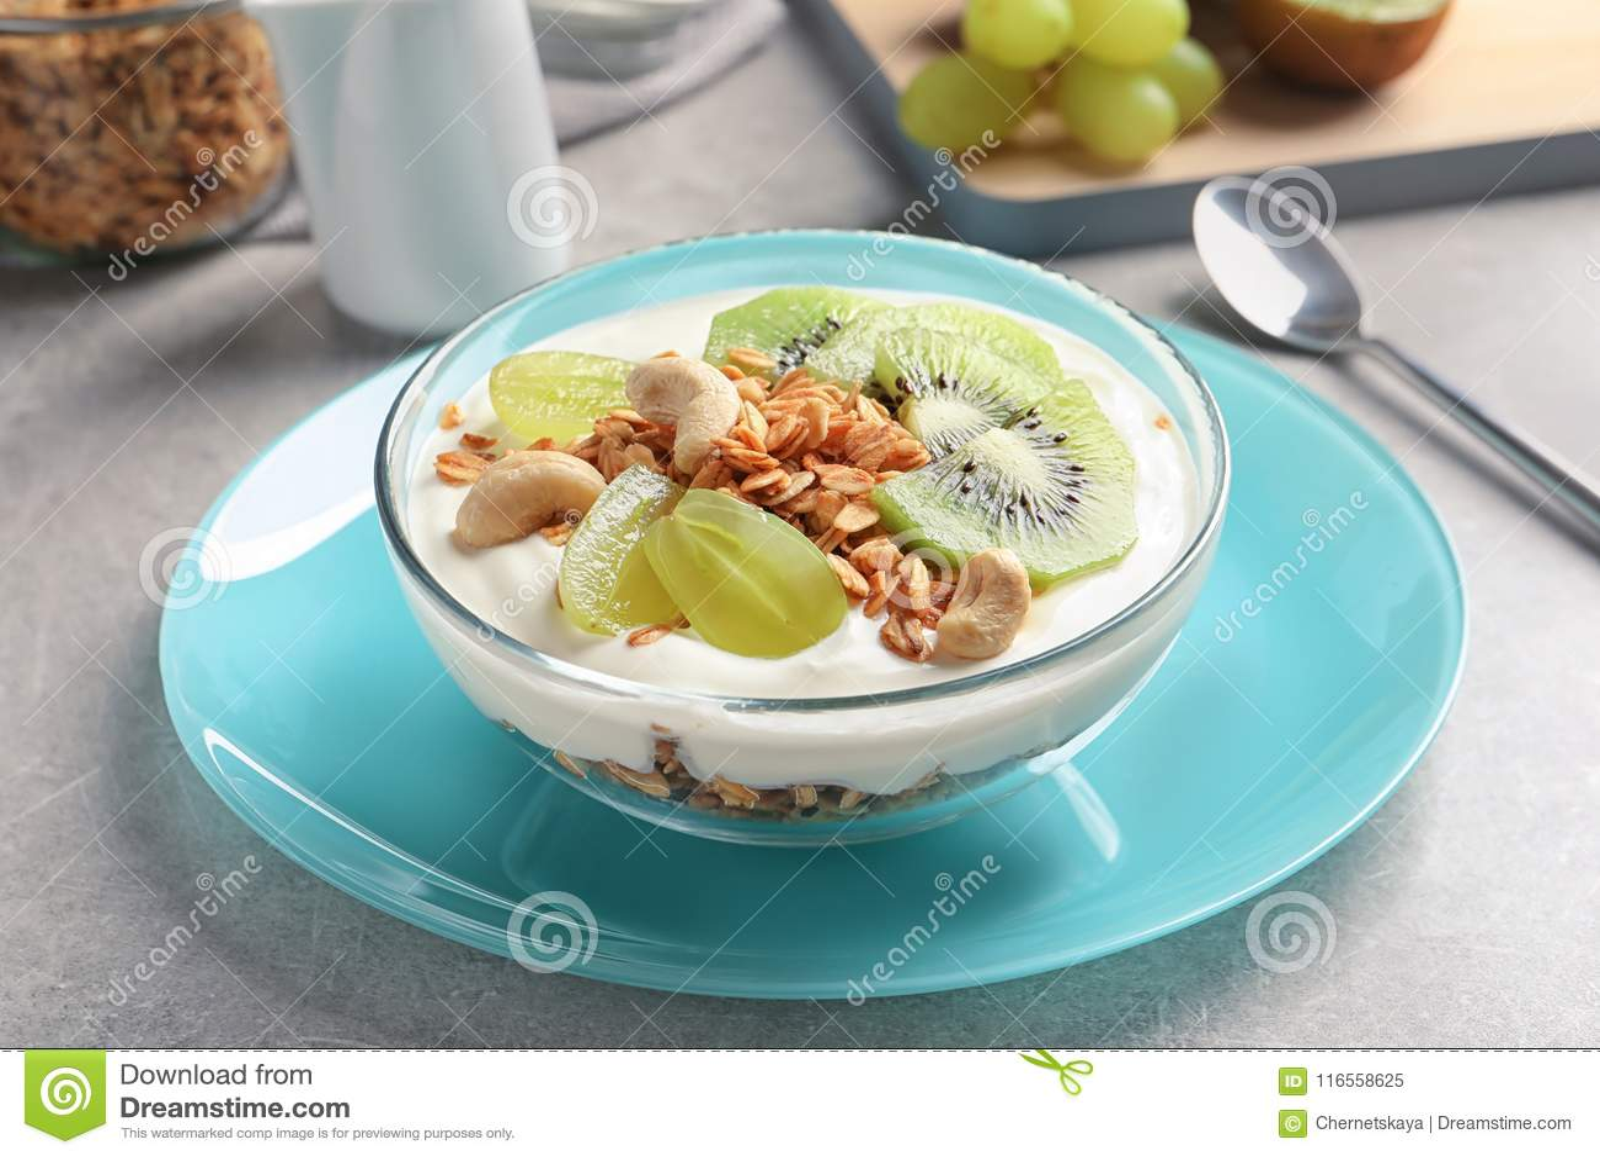 Bunke med yoghurt, frukter och granola